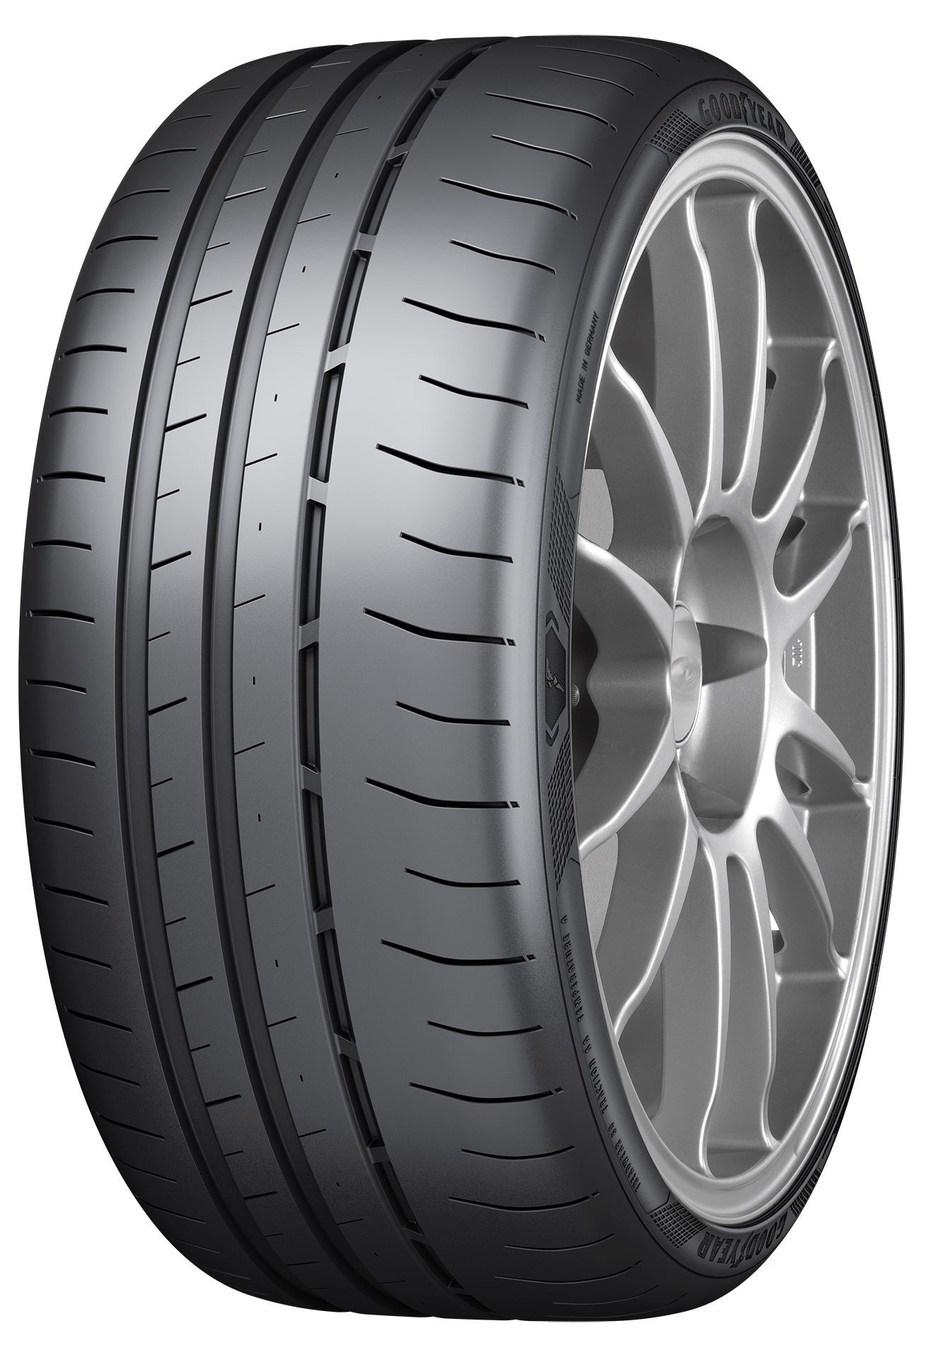 Eagle F1 SuperSport R Tire shots (3-4 view only) Original 92718 (PRNewsfoto/Goodyear)